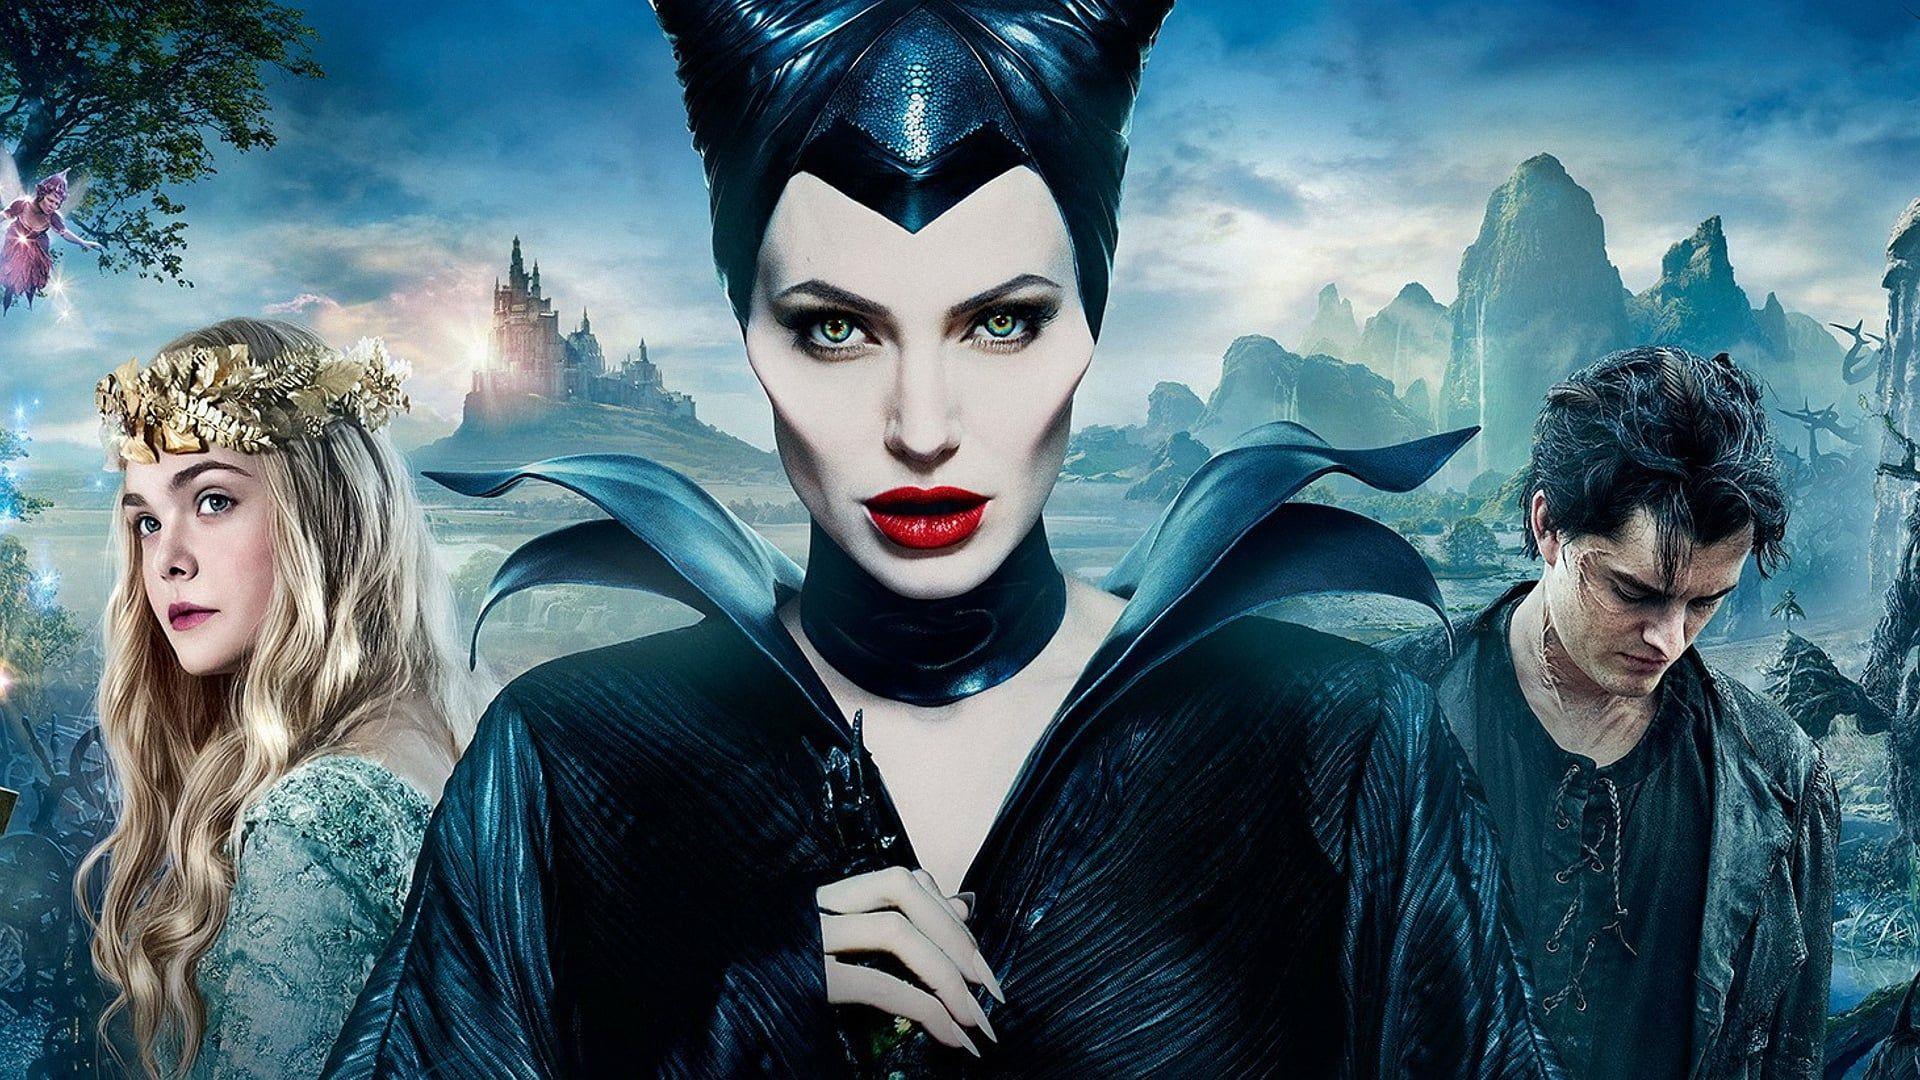 Demona 2014 Online Teljes Film Filmek Magyarul Letoltes Hd A Gyonyoru Es Tiszta Szivu Fiatal Lany Demona Idilli Korulme Maleficent Film Completi Giovani Donne